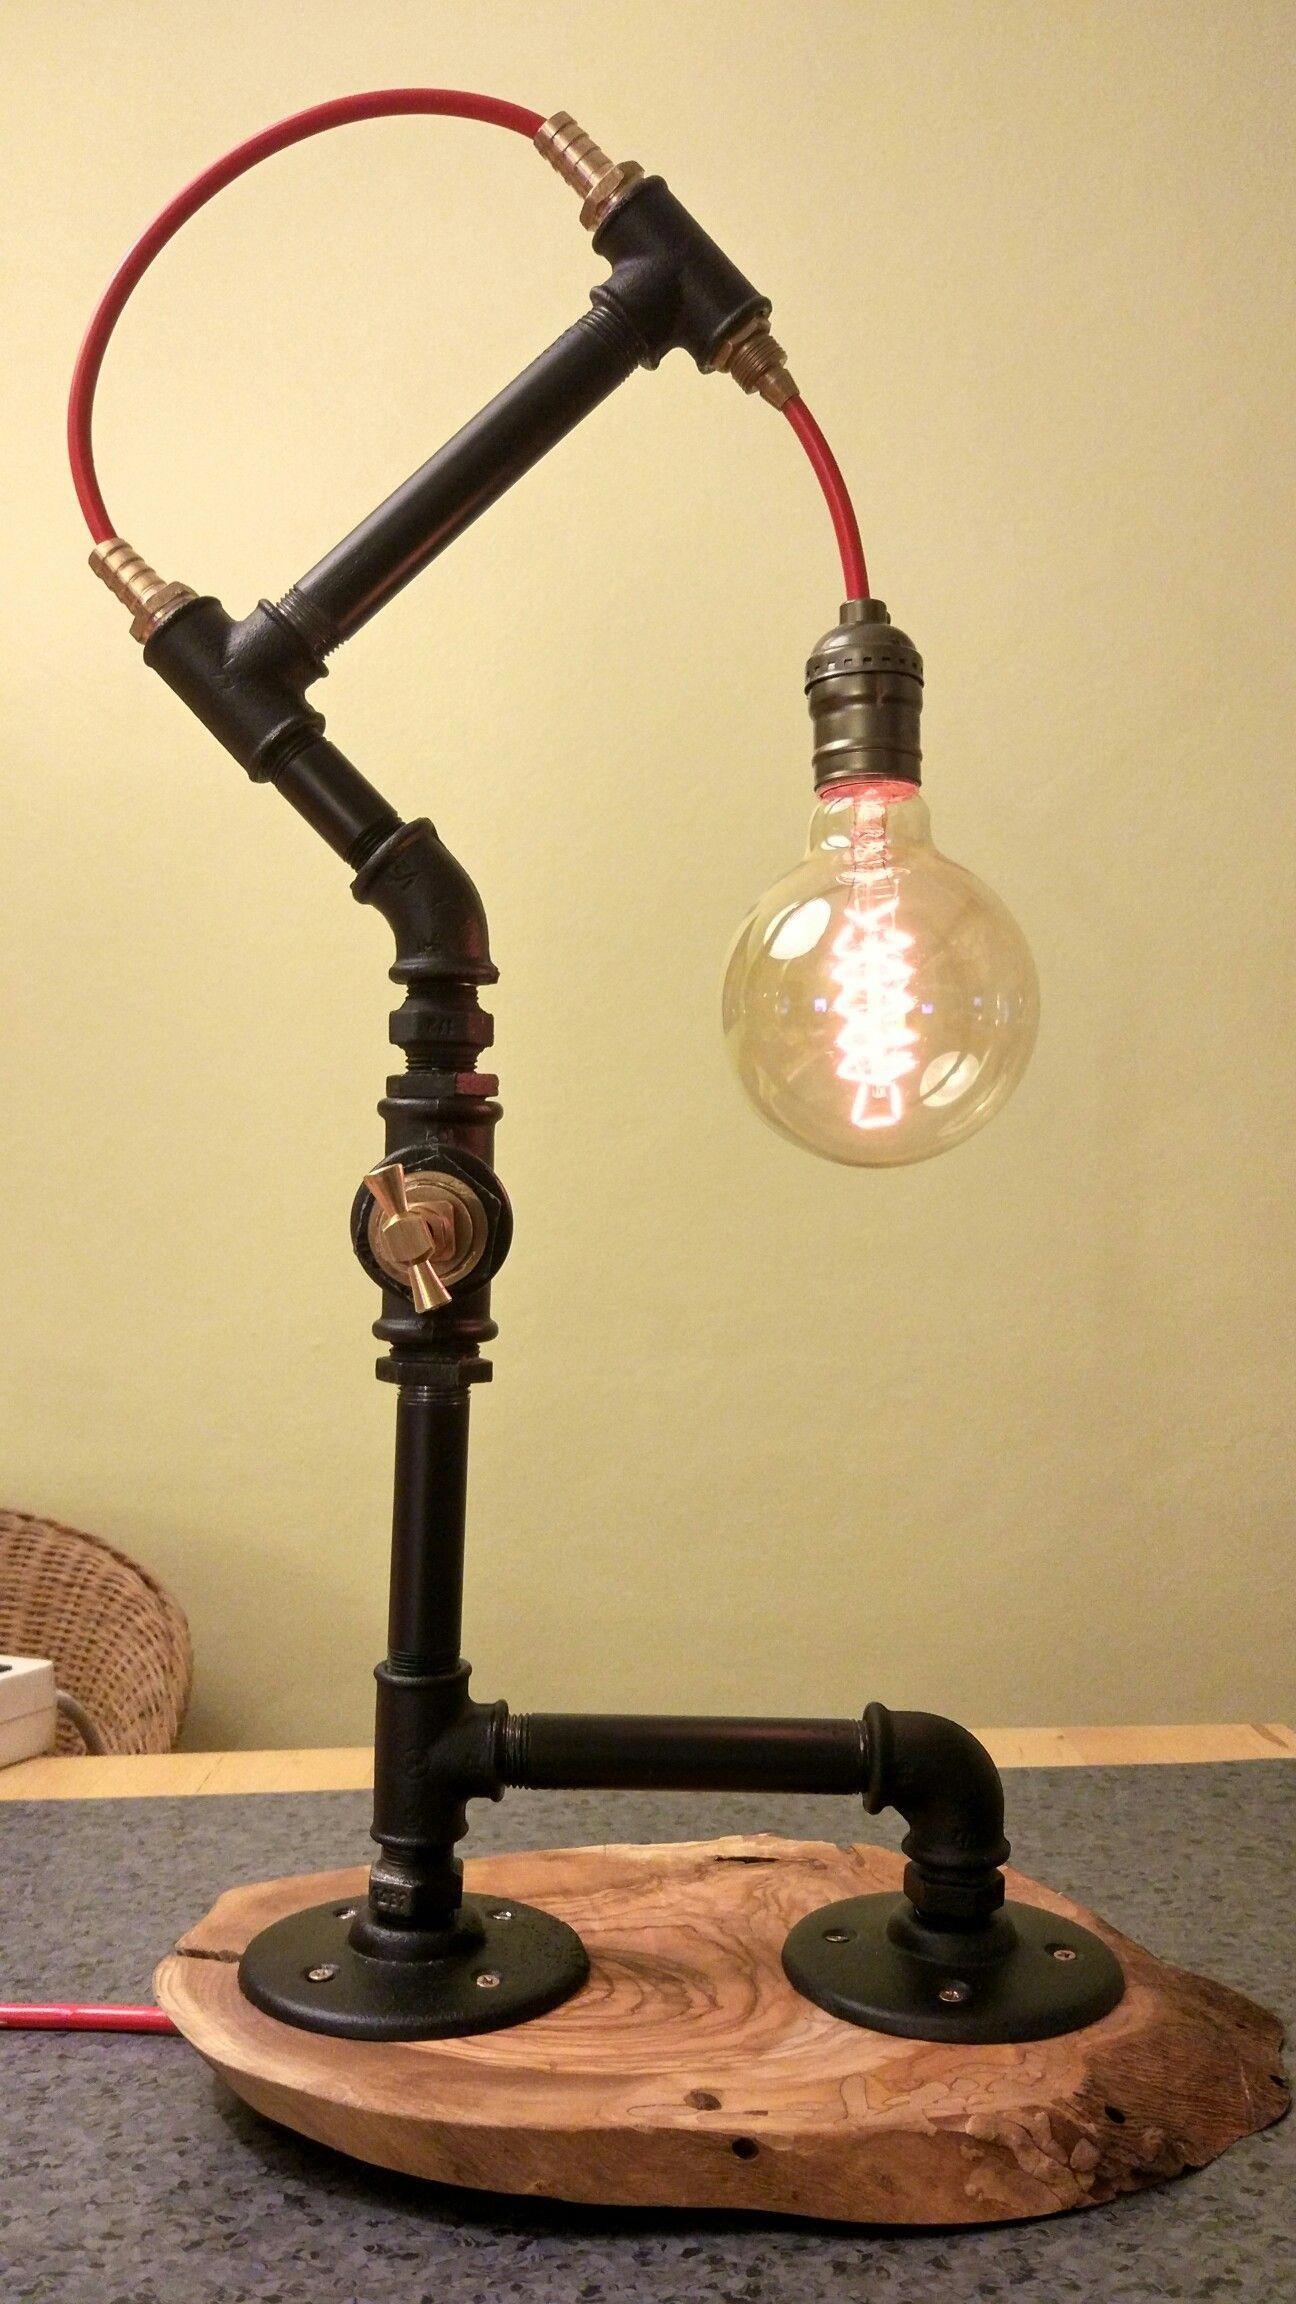 Pipelamp Shabbychiclamps In 2020 Rohr Lampen Lampen Und Leuchten Lampen